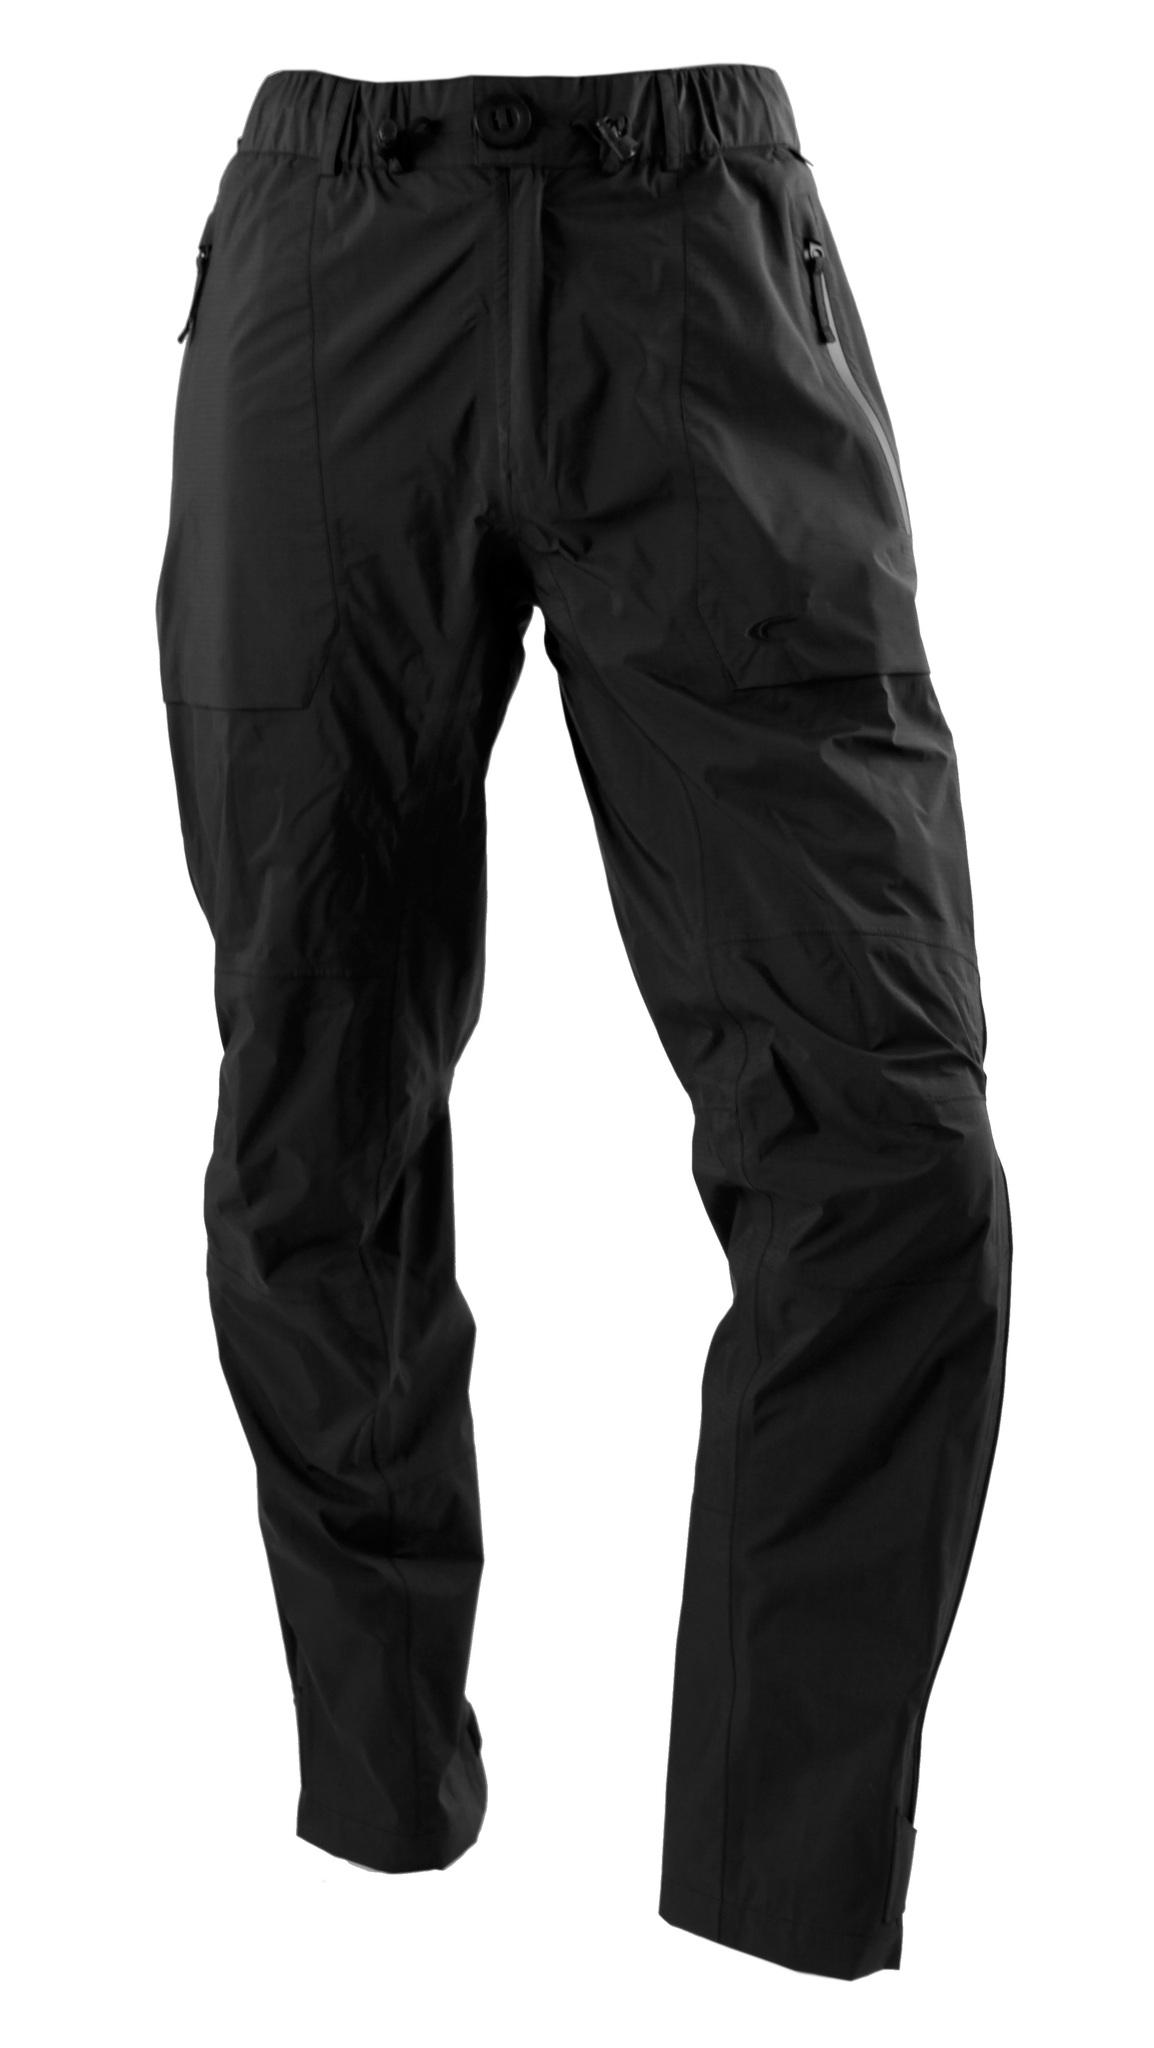 Брюки дождевые Carinthia PRG Rain Trousers